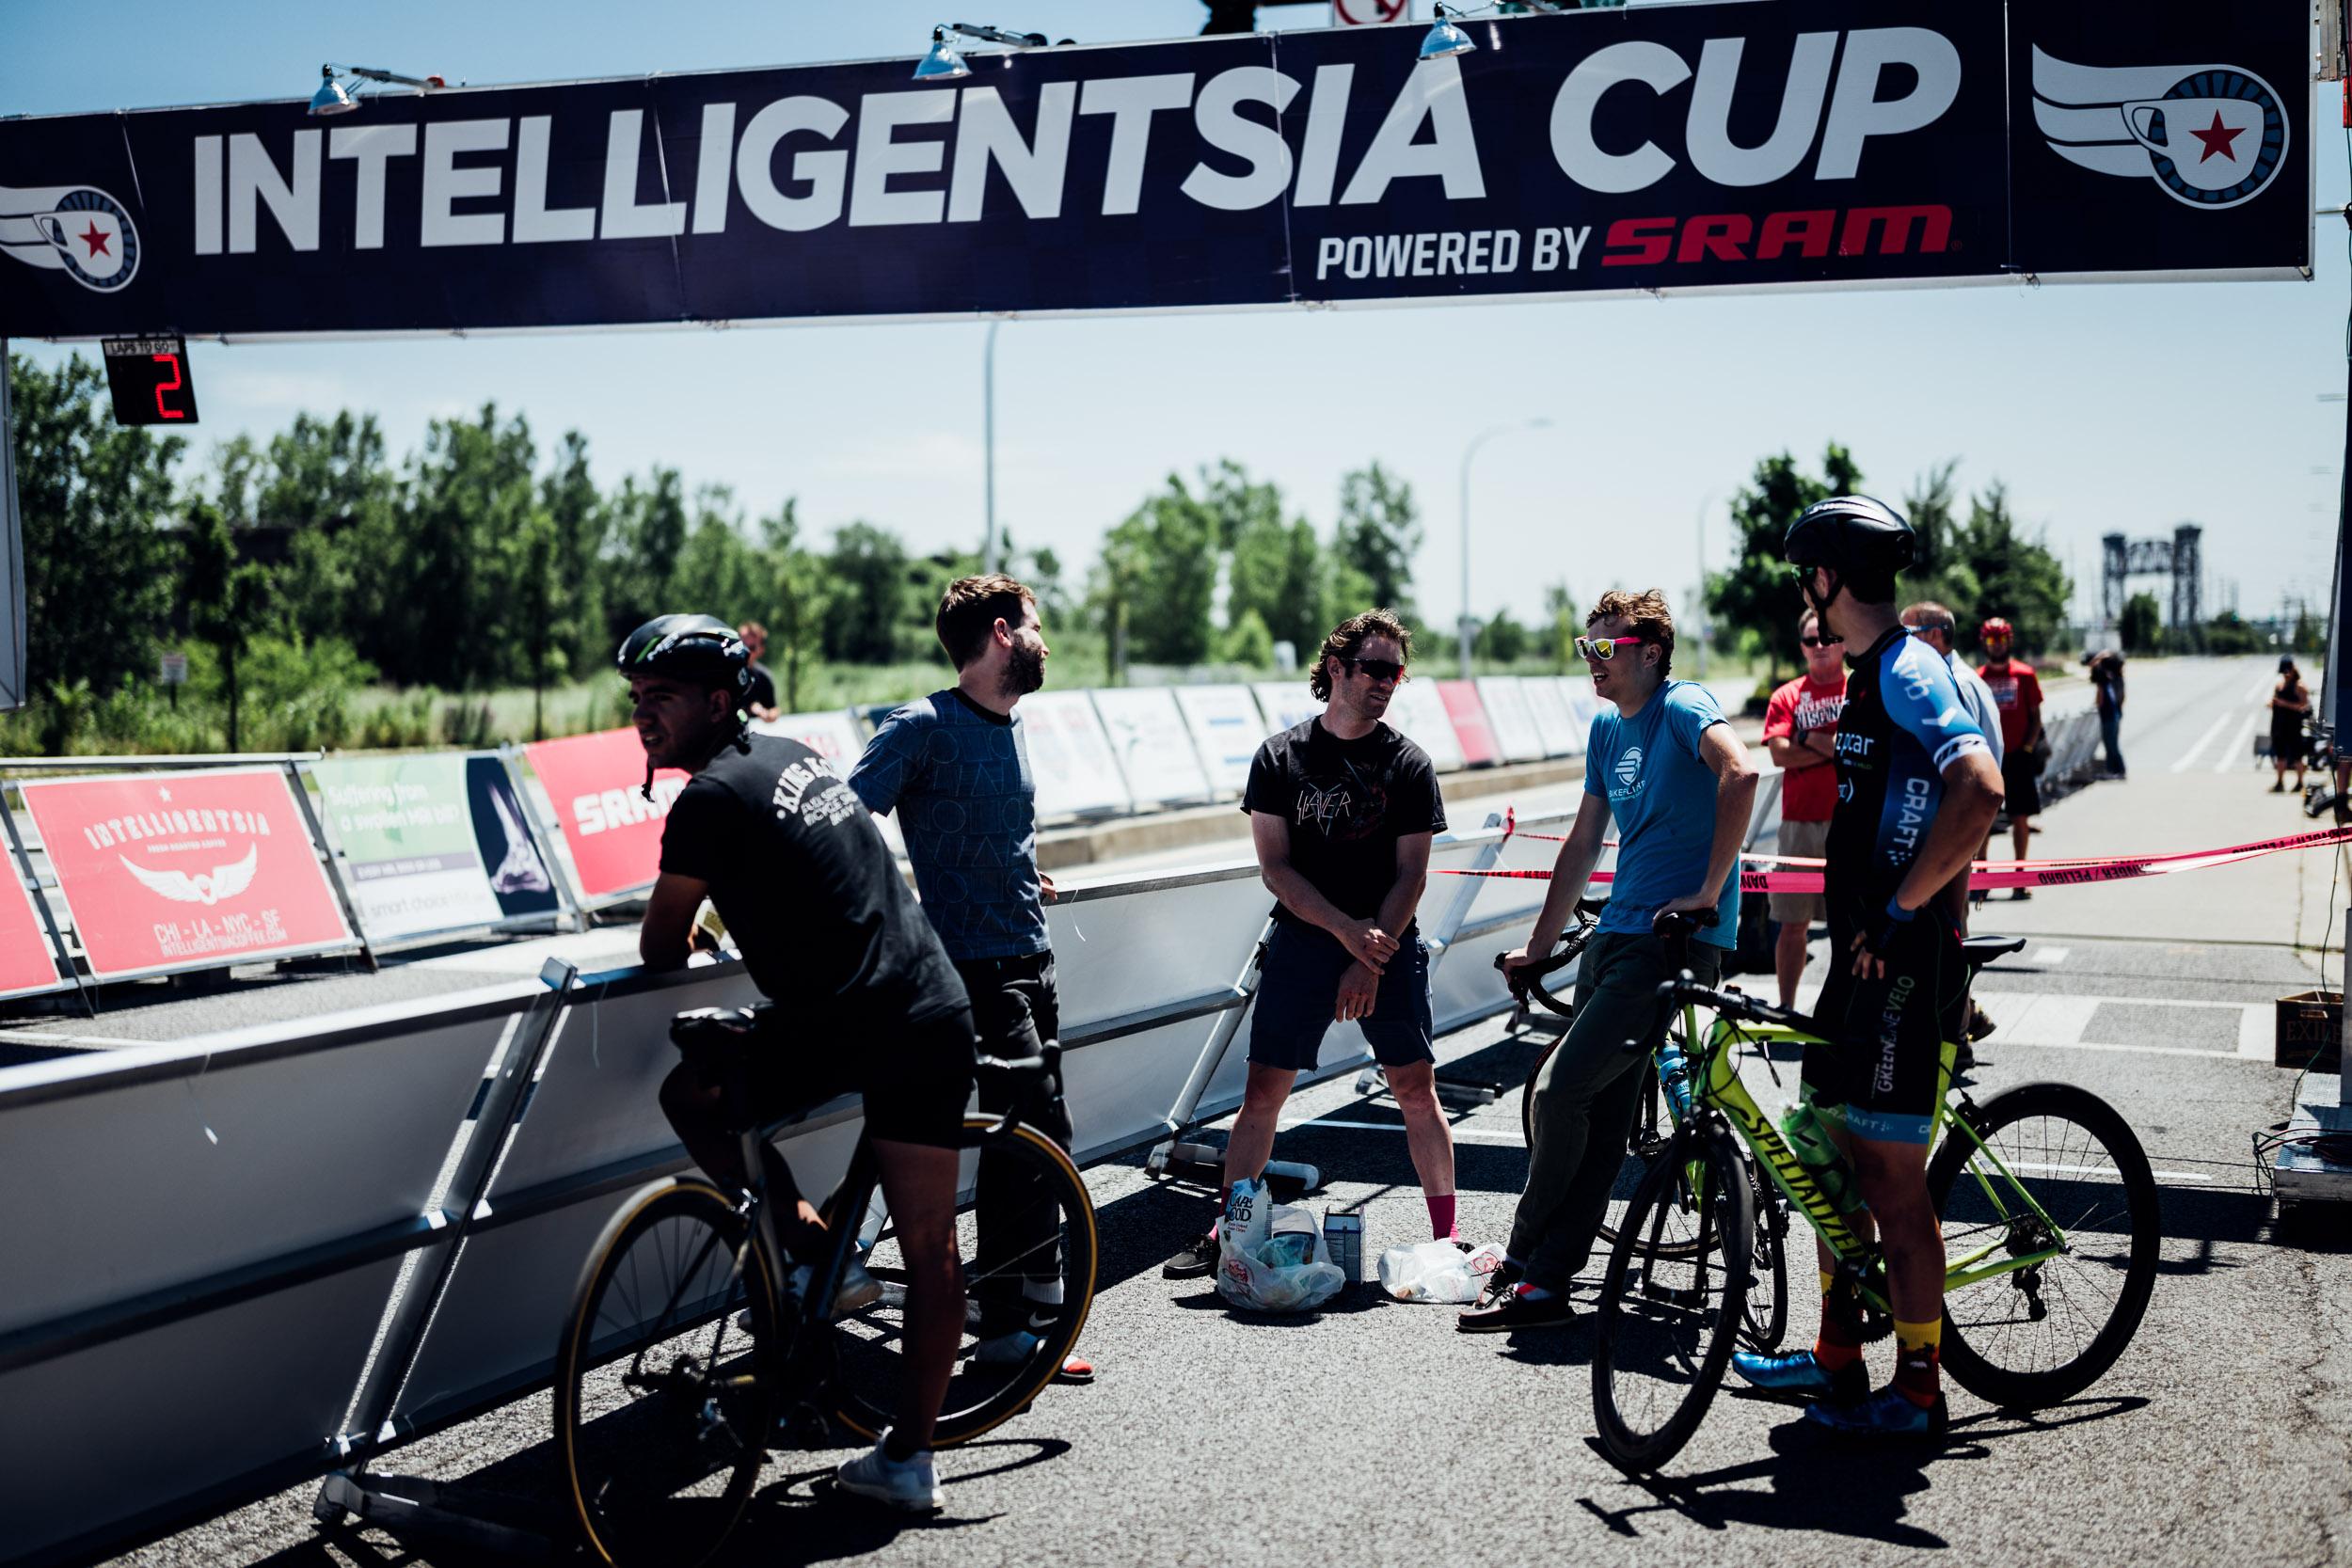 Photo Rhetoric - Intelligentsia Cup - To Be Determined-1029.jpg